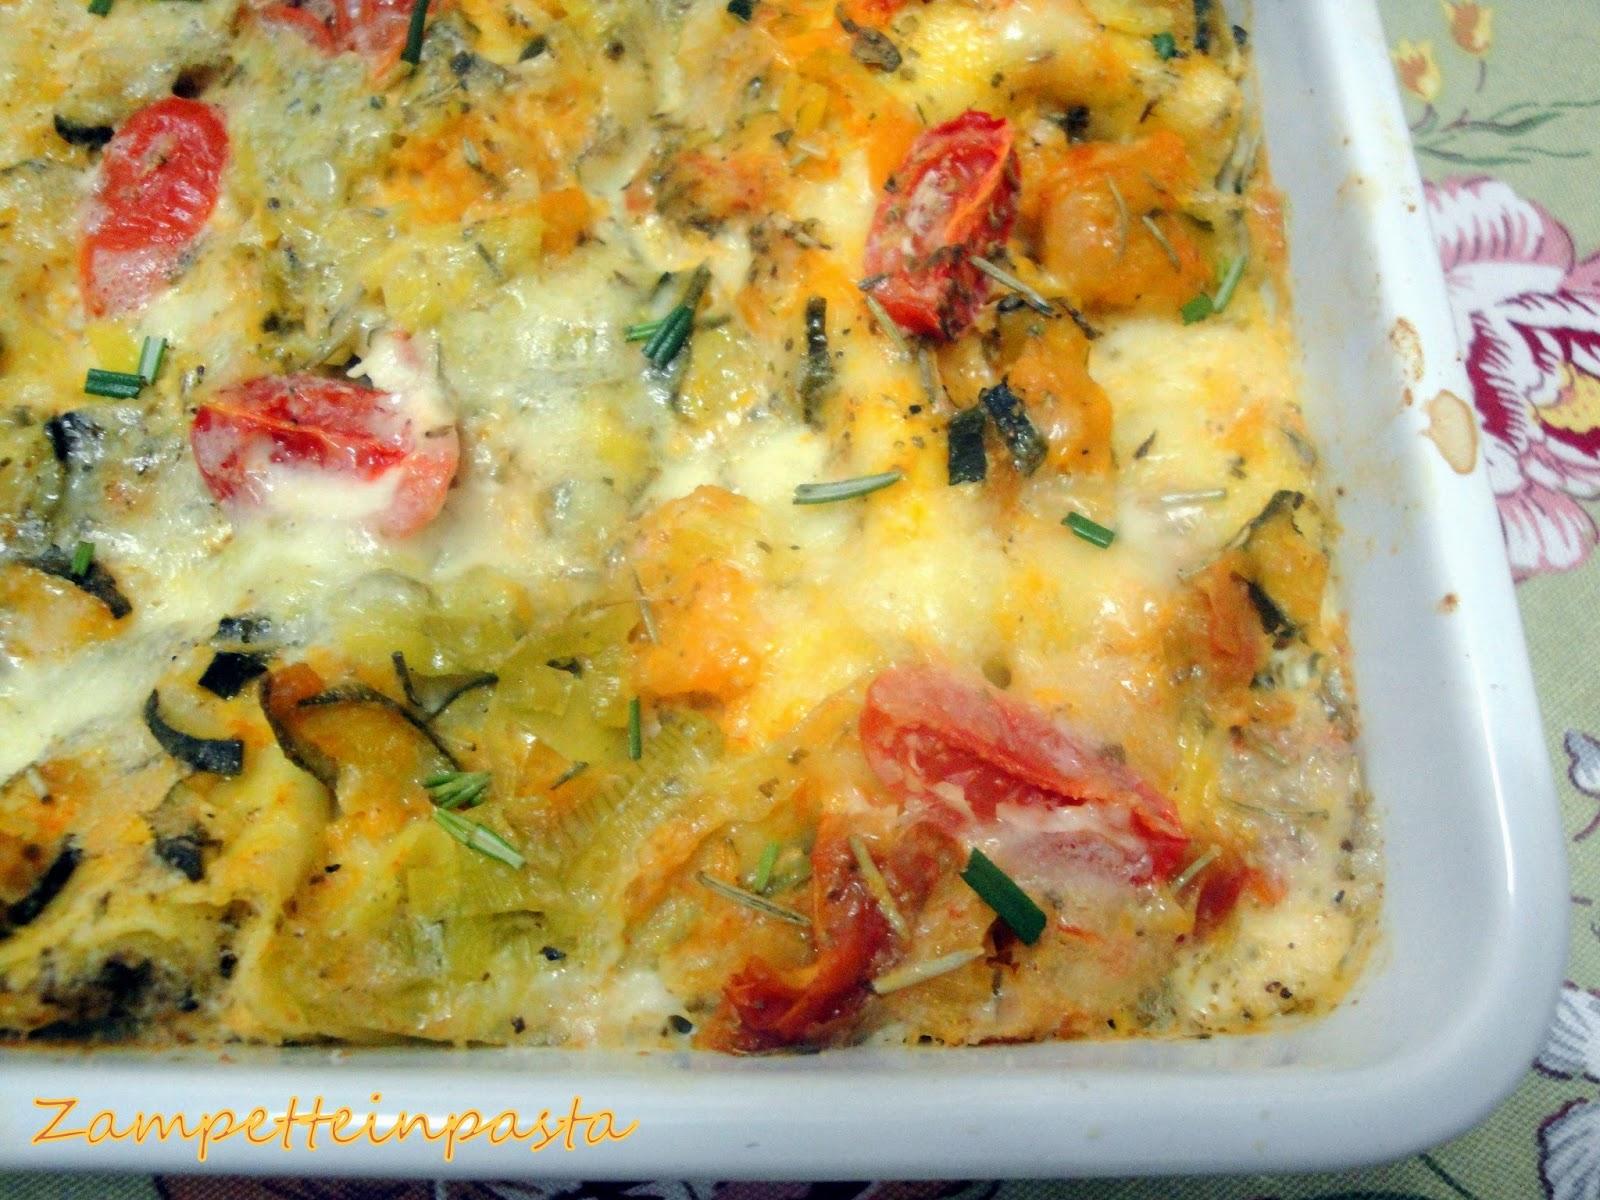 Lasagne vegetariane - Primo piatto con le verdure